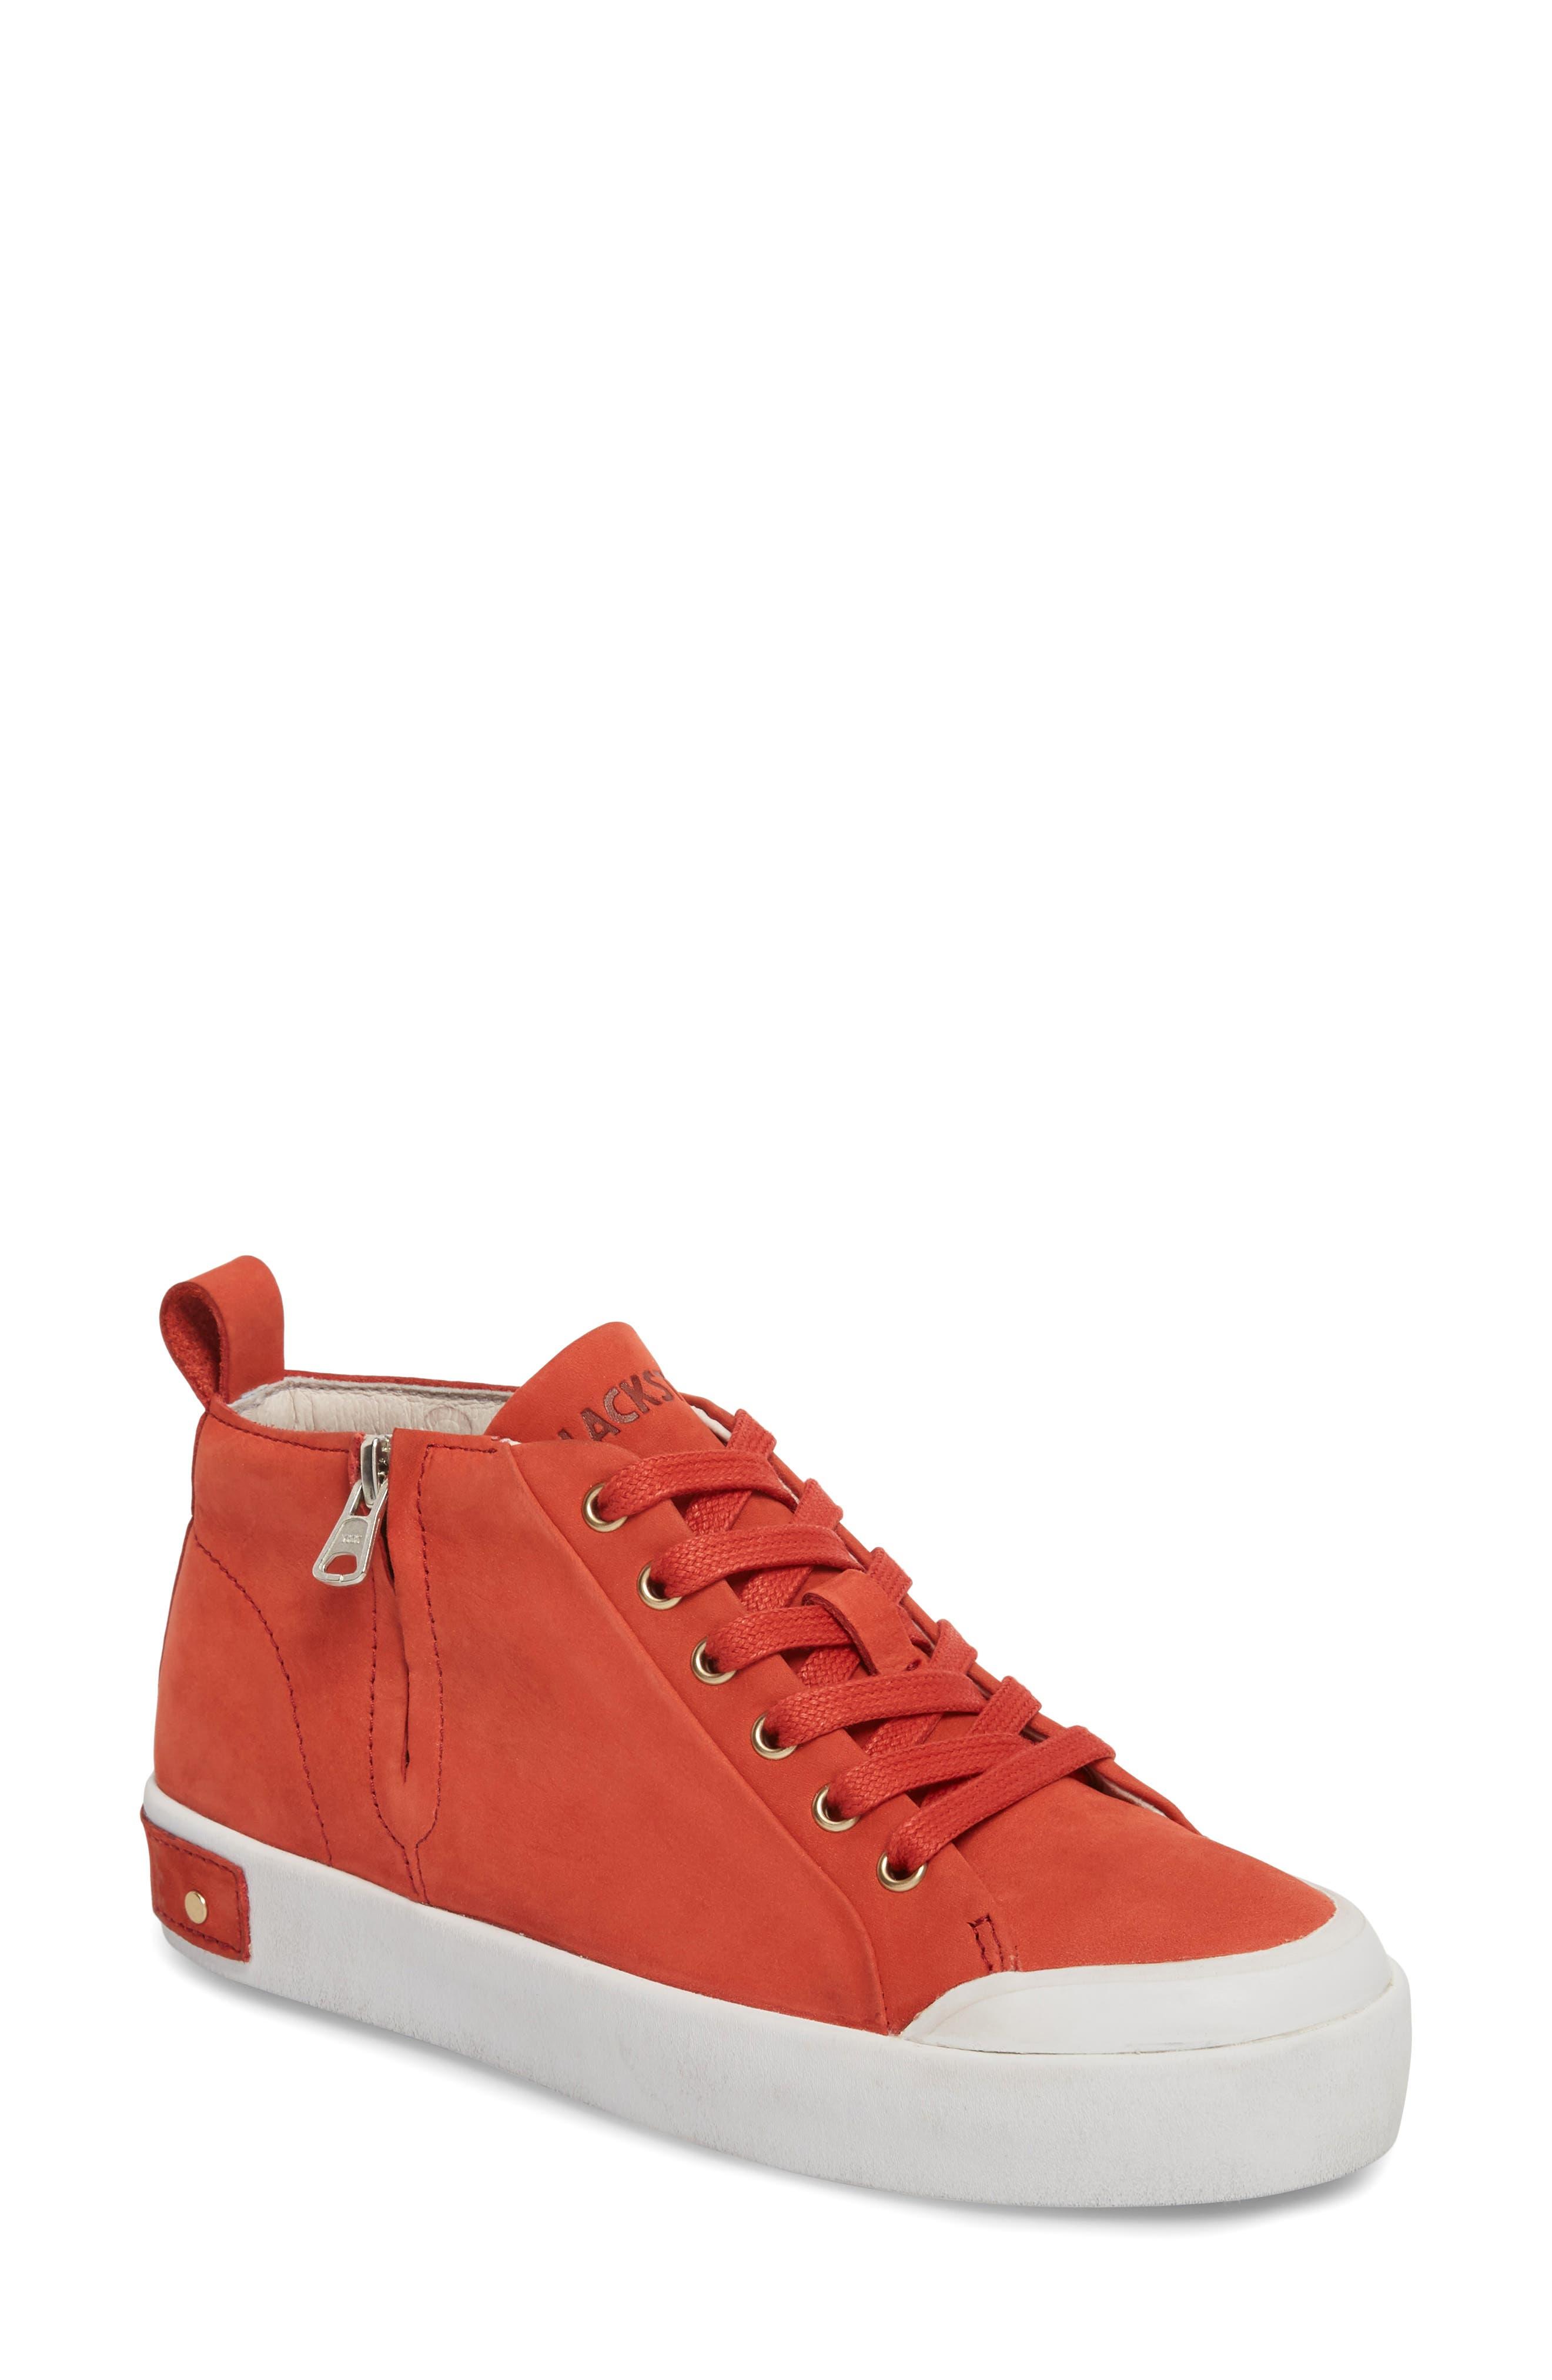 Blackstone Pl83 Mid Rise Sneaker, Red